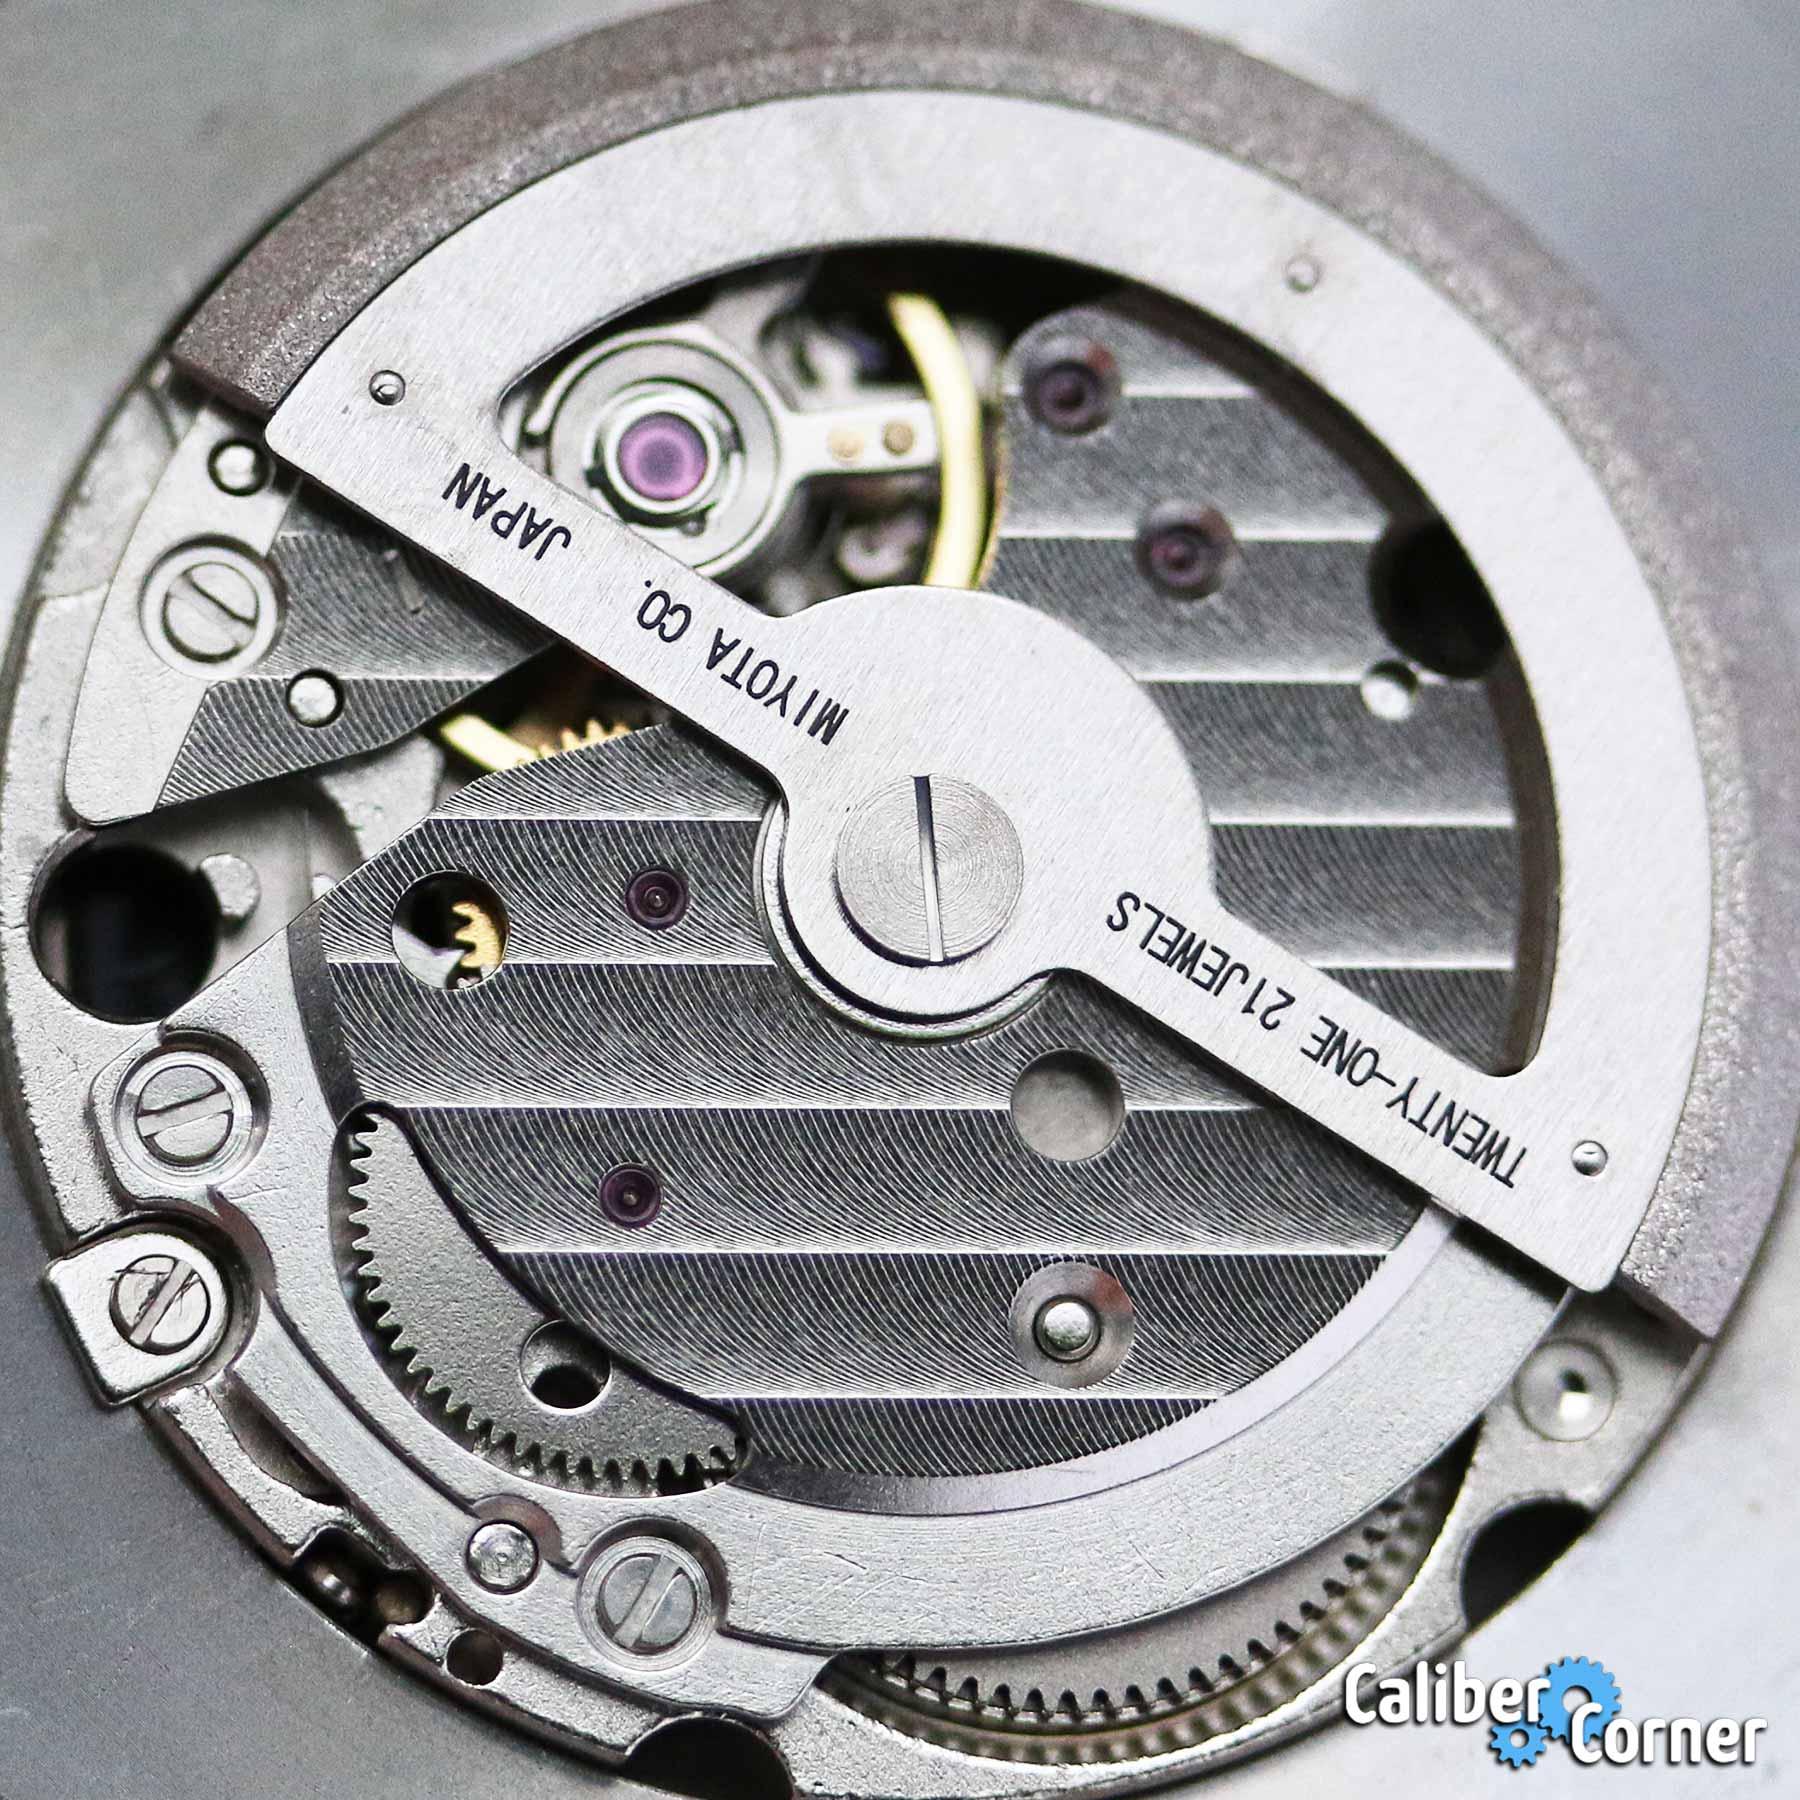 Miyota Caliber 8217 Gears